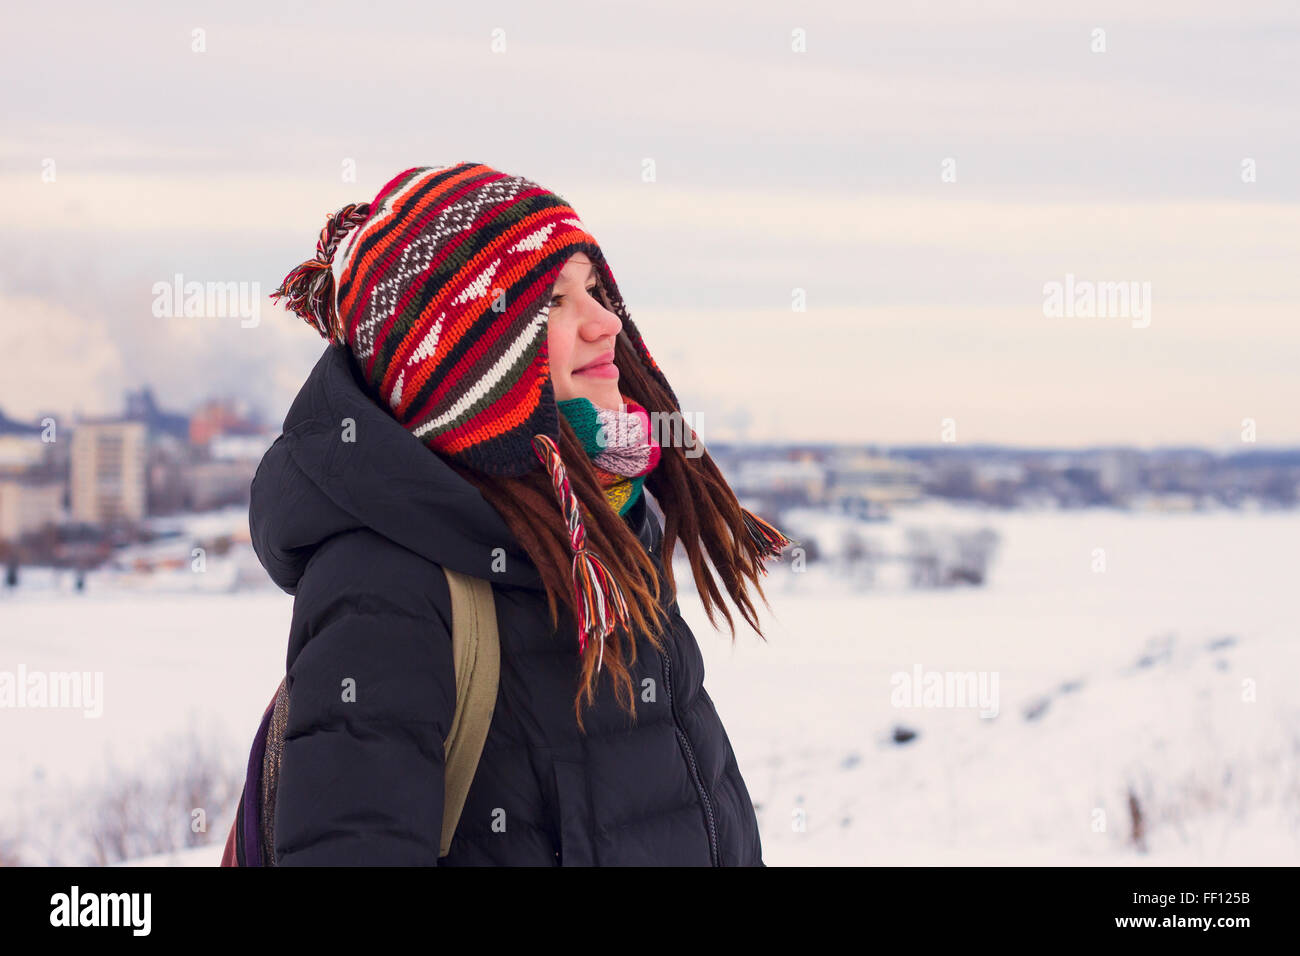 Mujer caucásica admirando un paisaje nevado Foto de stock